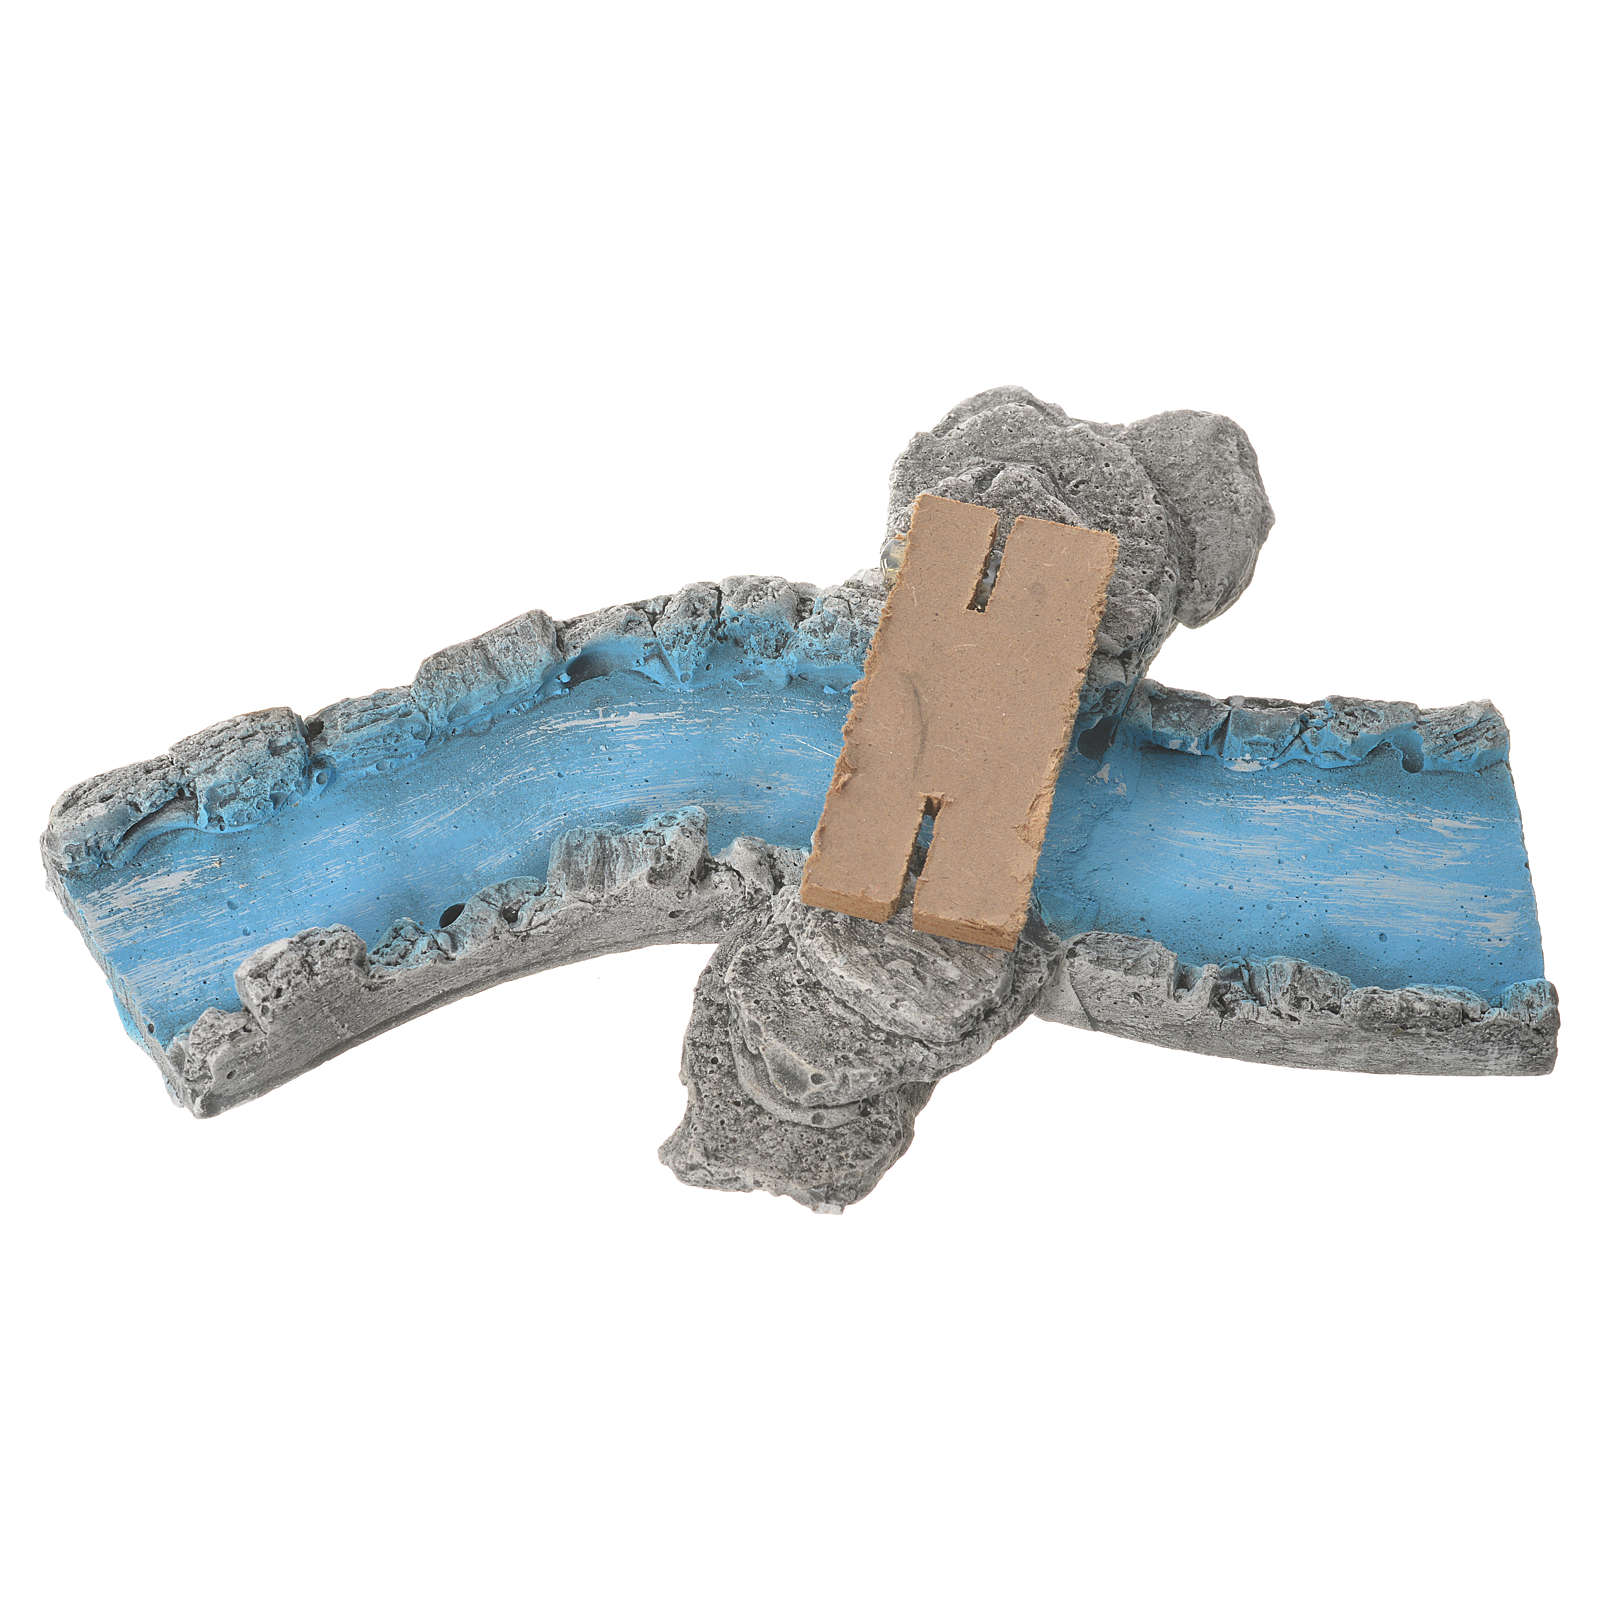 Nativity setting, river parts in plaster 4 pcs 4